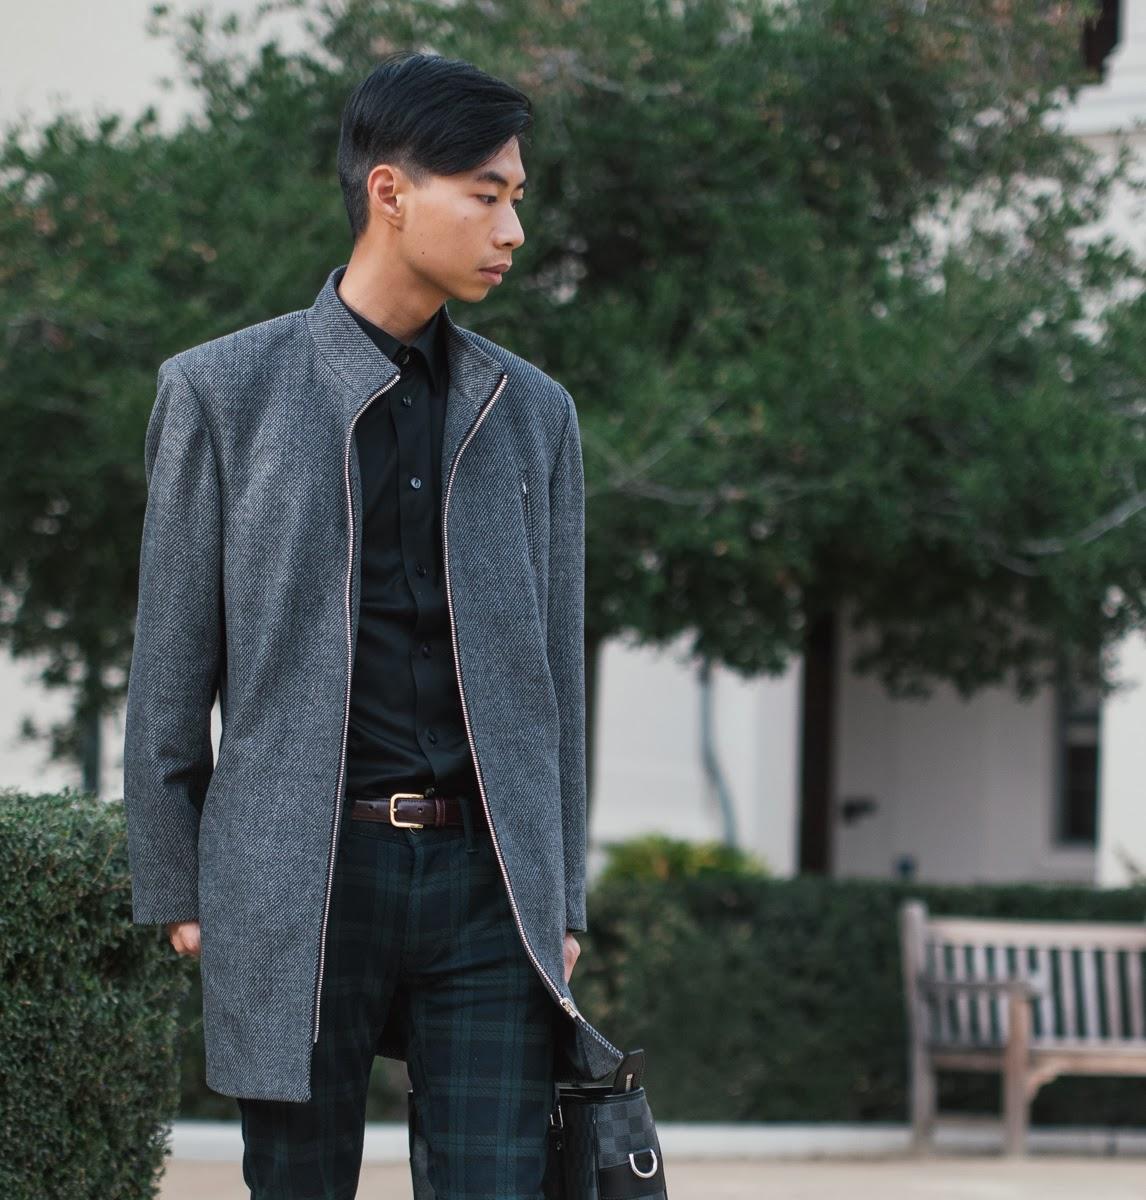 mybelonging-tommylei-etonshirts-redribbonss14-louisvuitton-menswear-5.jpg